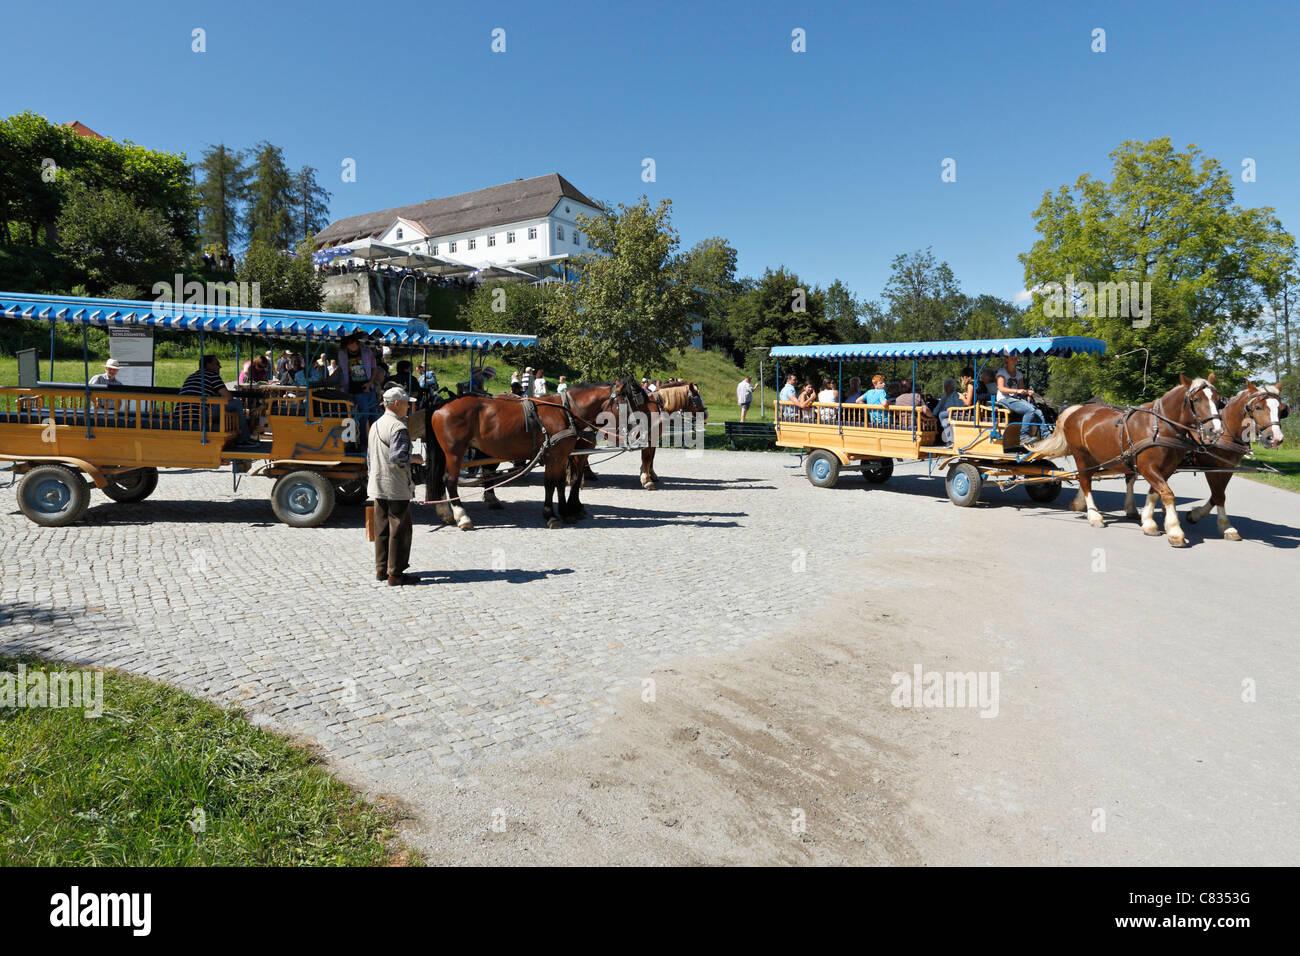 Horse carriages on the Herreninsel, Chiemgau Upper Bavaria Germany - Stock Image